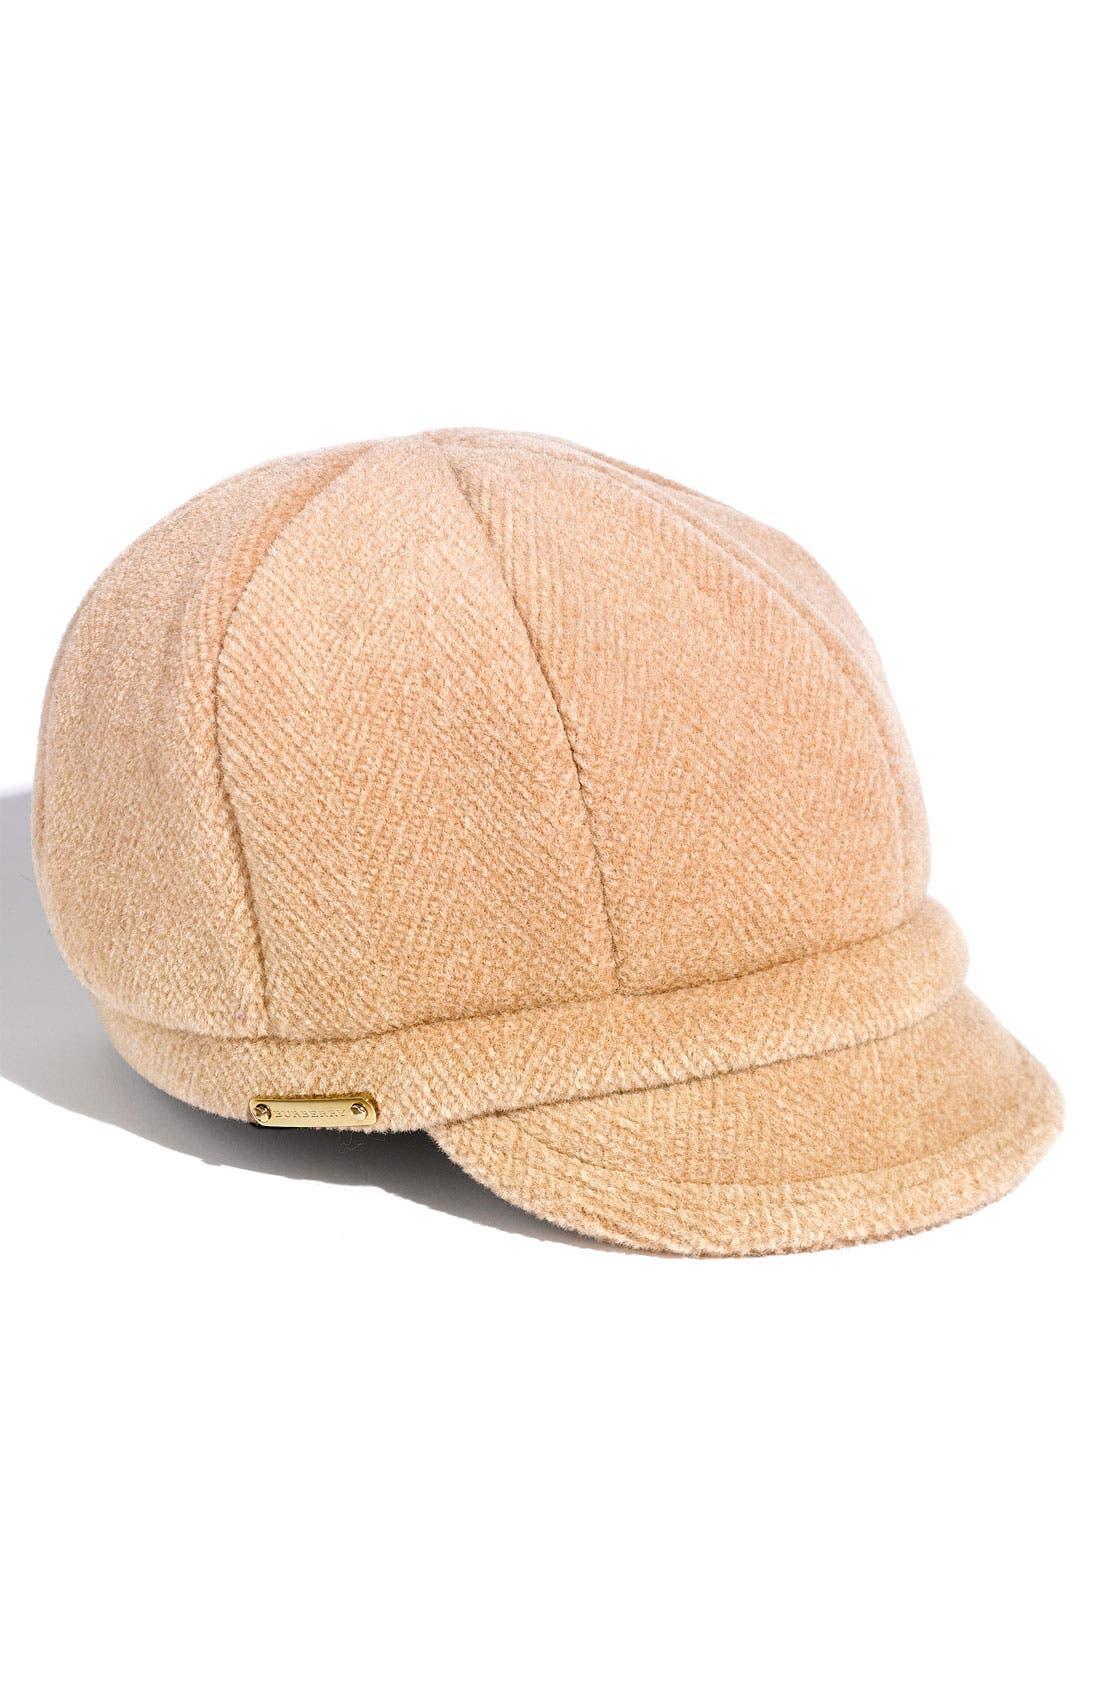 Alternate Image 1 Selected - Burberry Wool Duffle Cap